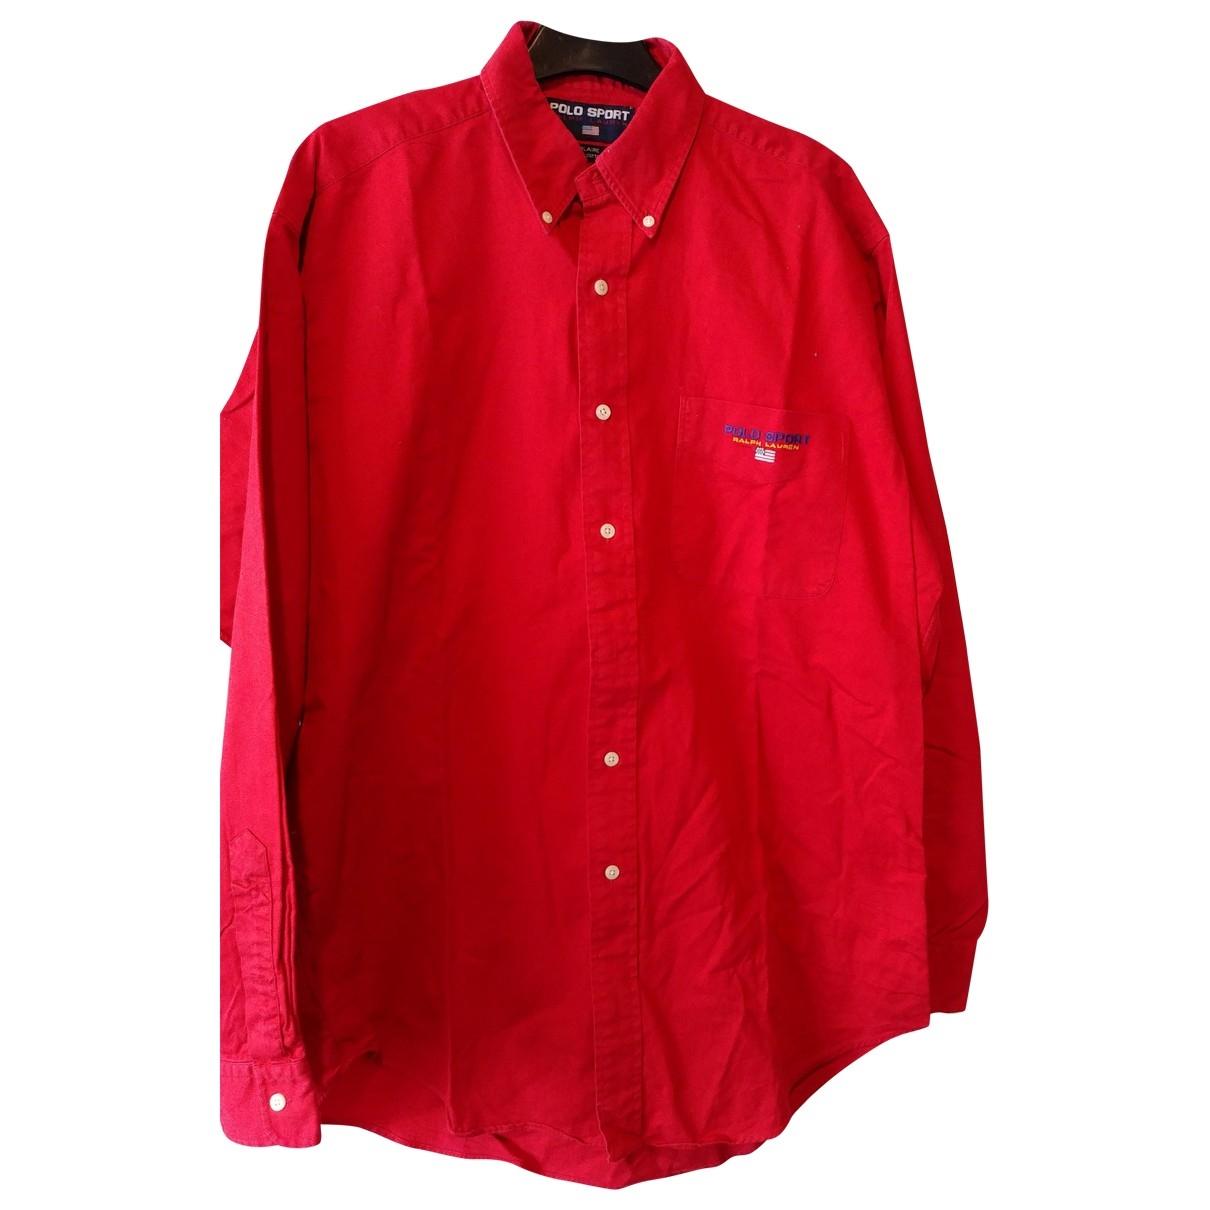 Polo Ralph Lauren \N Red Cotton Shirts for Men M International